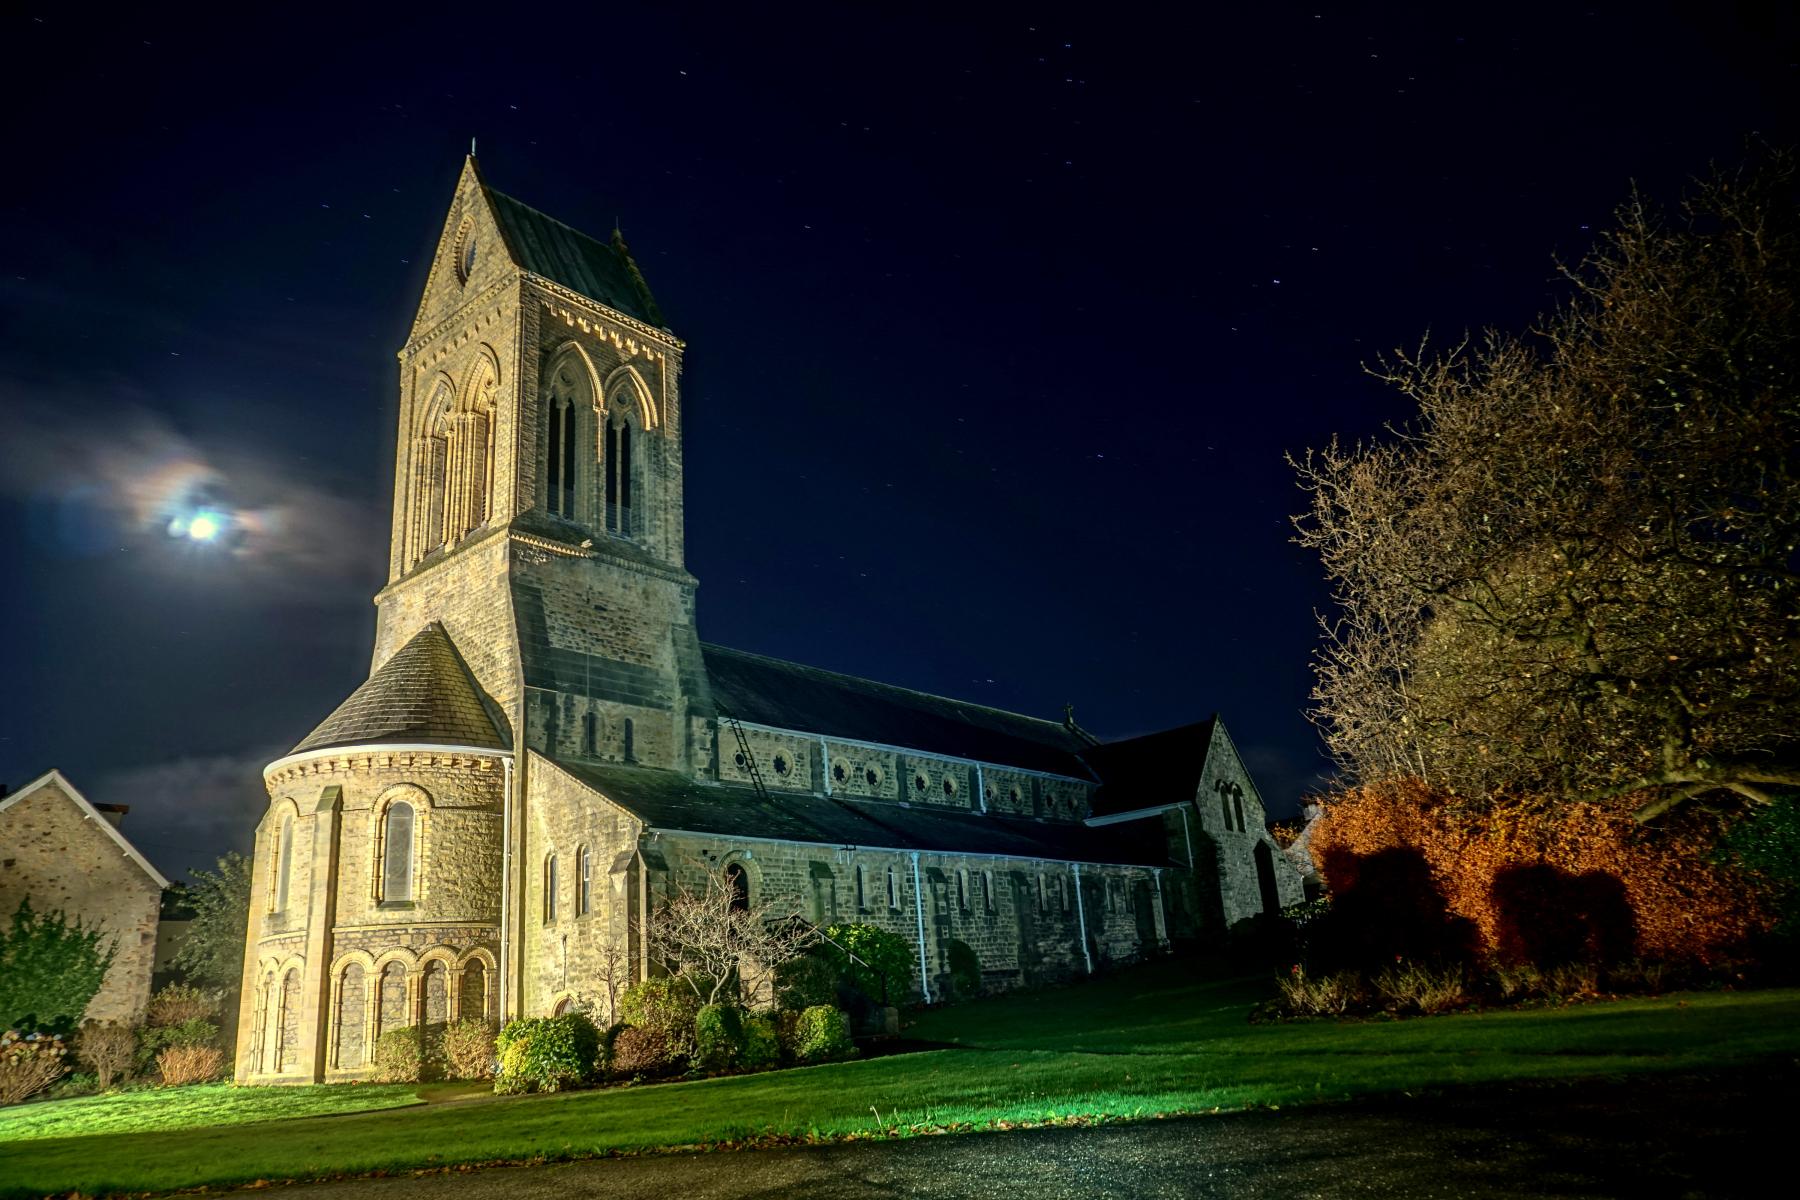 Church at Night (by Ian Greene)